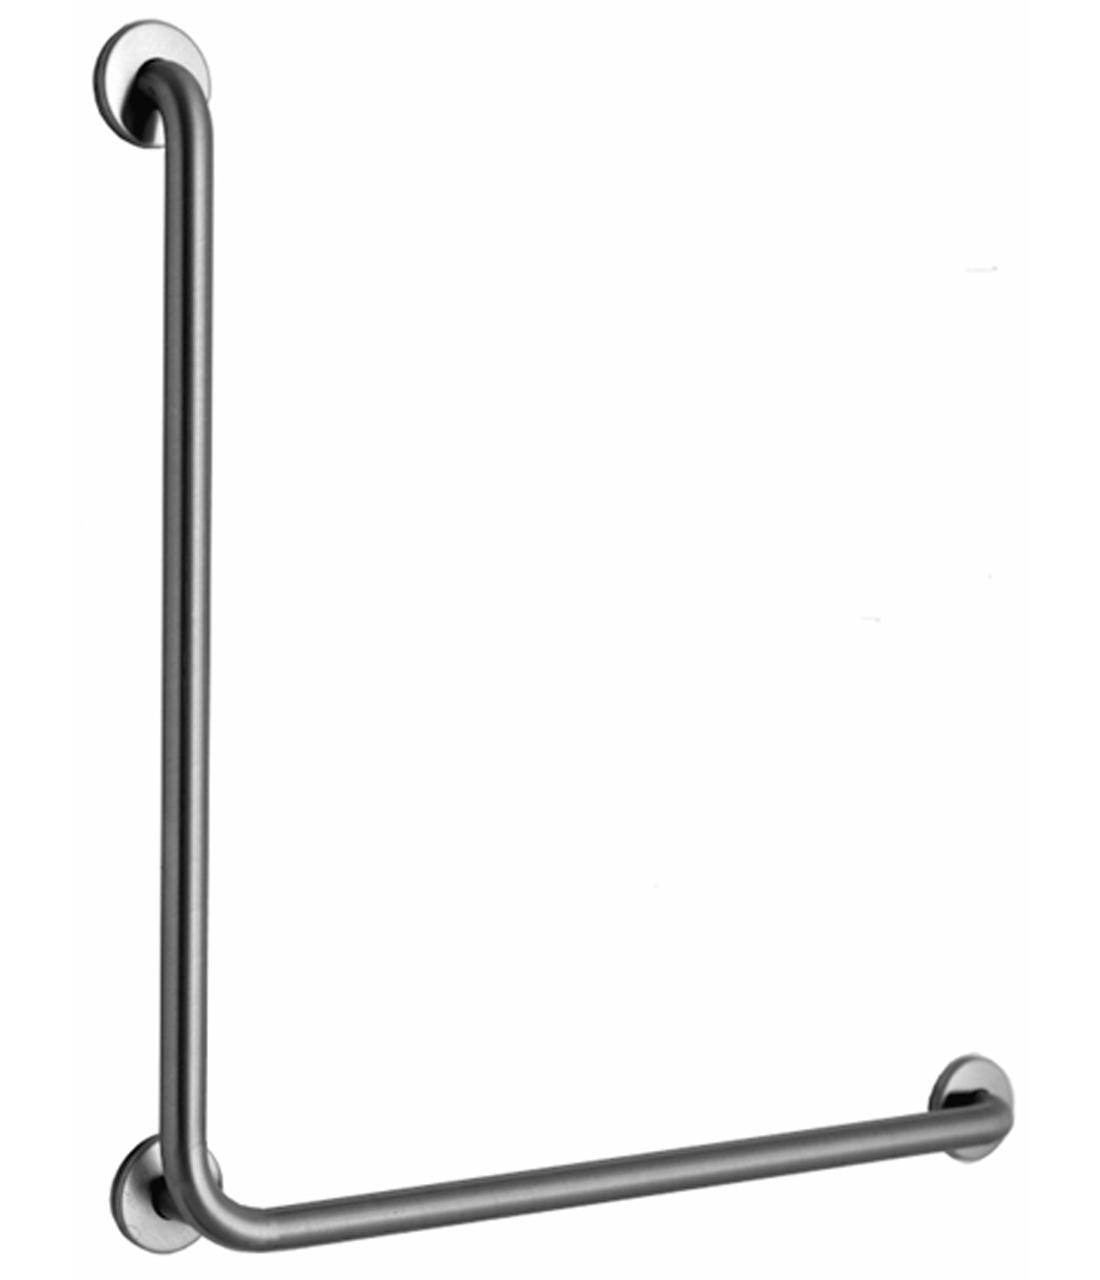 Bobrick B-6898.99 L-Shaped 90 Degree Grab Bar w/ Peened Grip